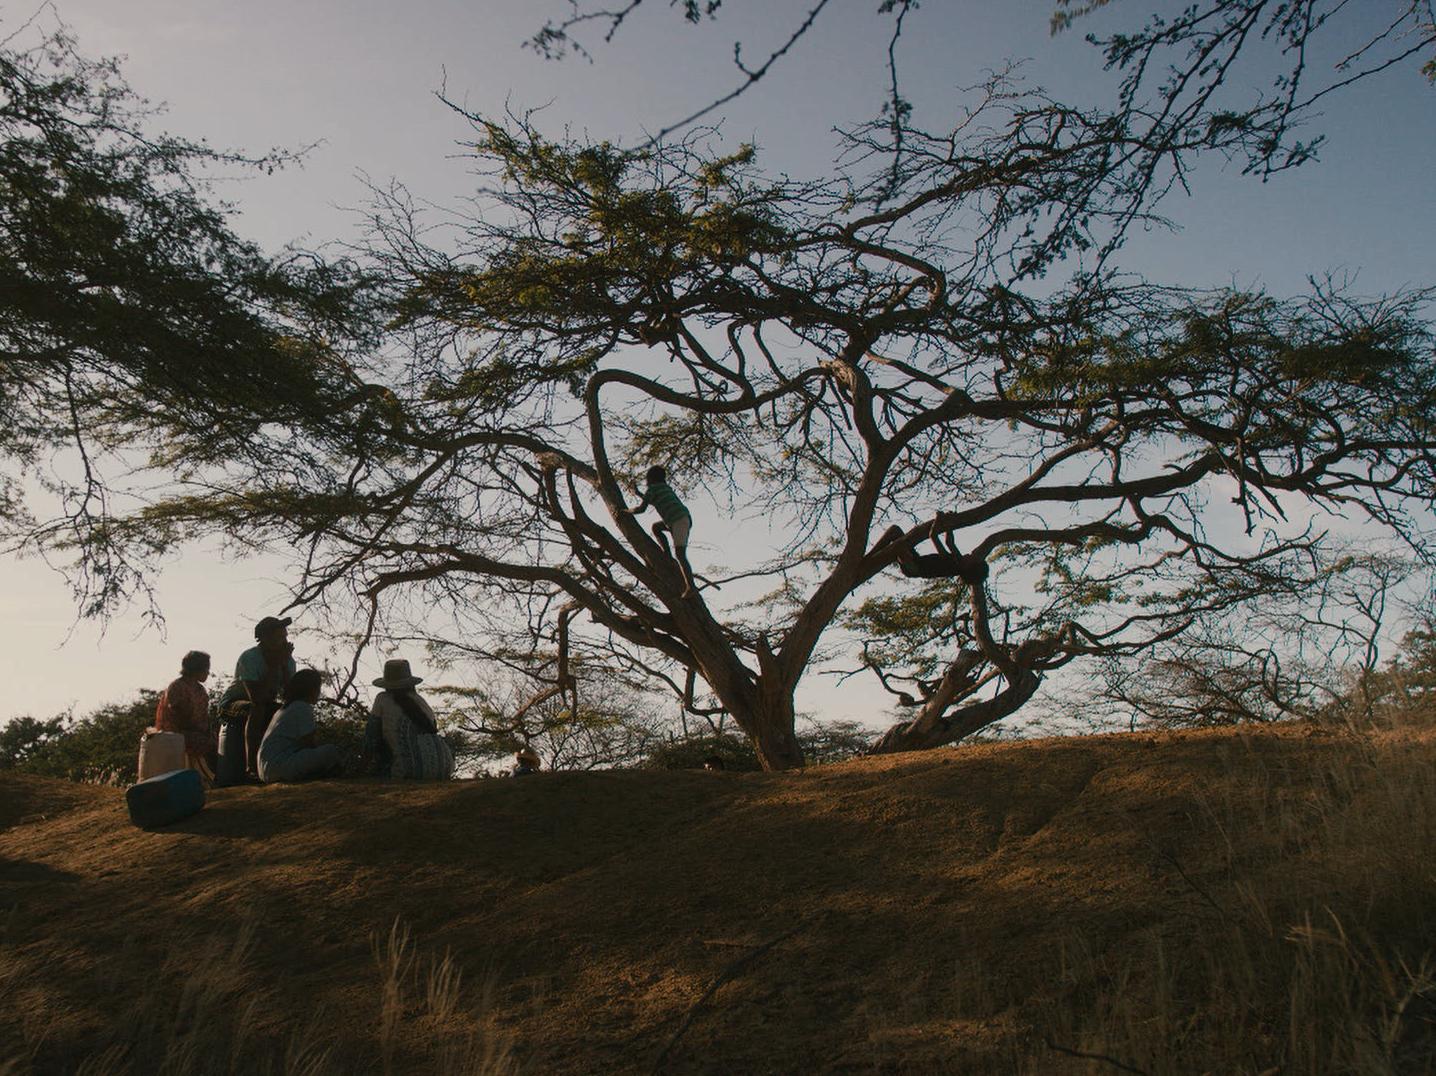 Desierto de la Guajira, en donde se desarrolla la historia de Lapü